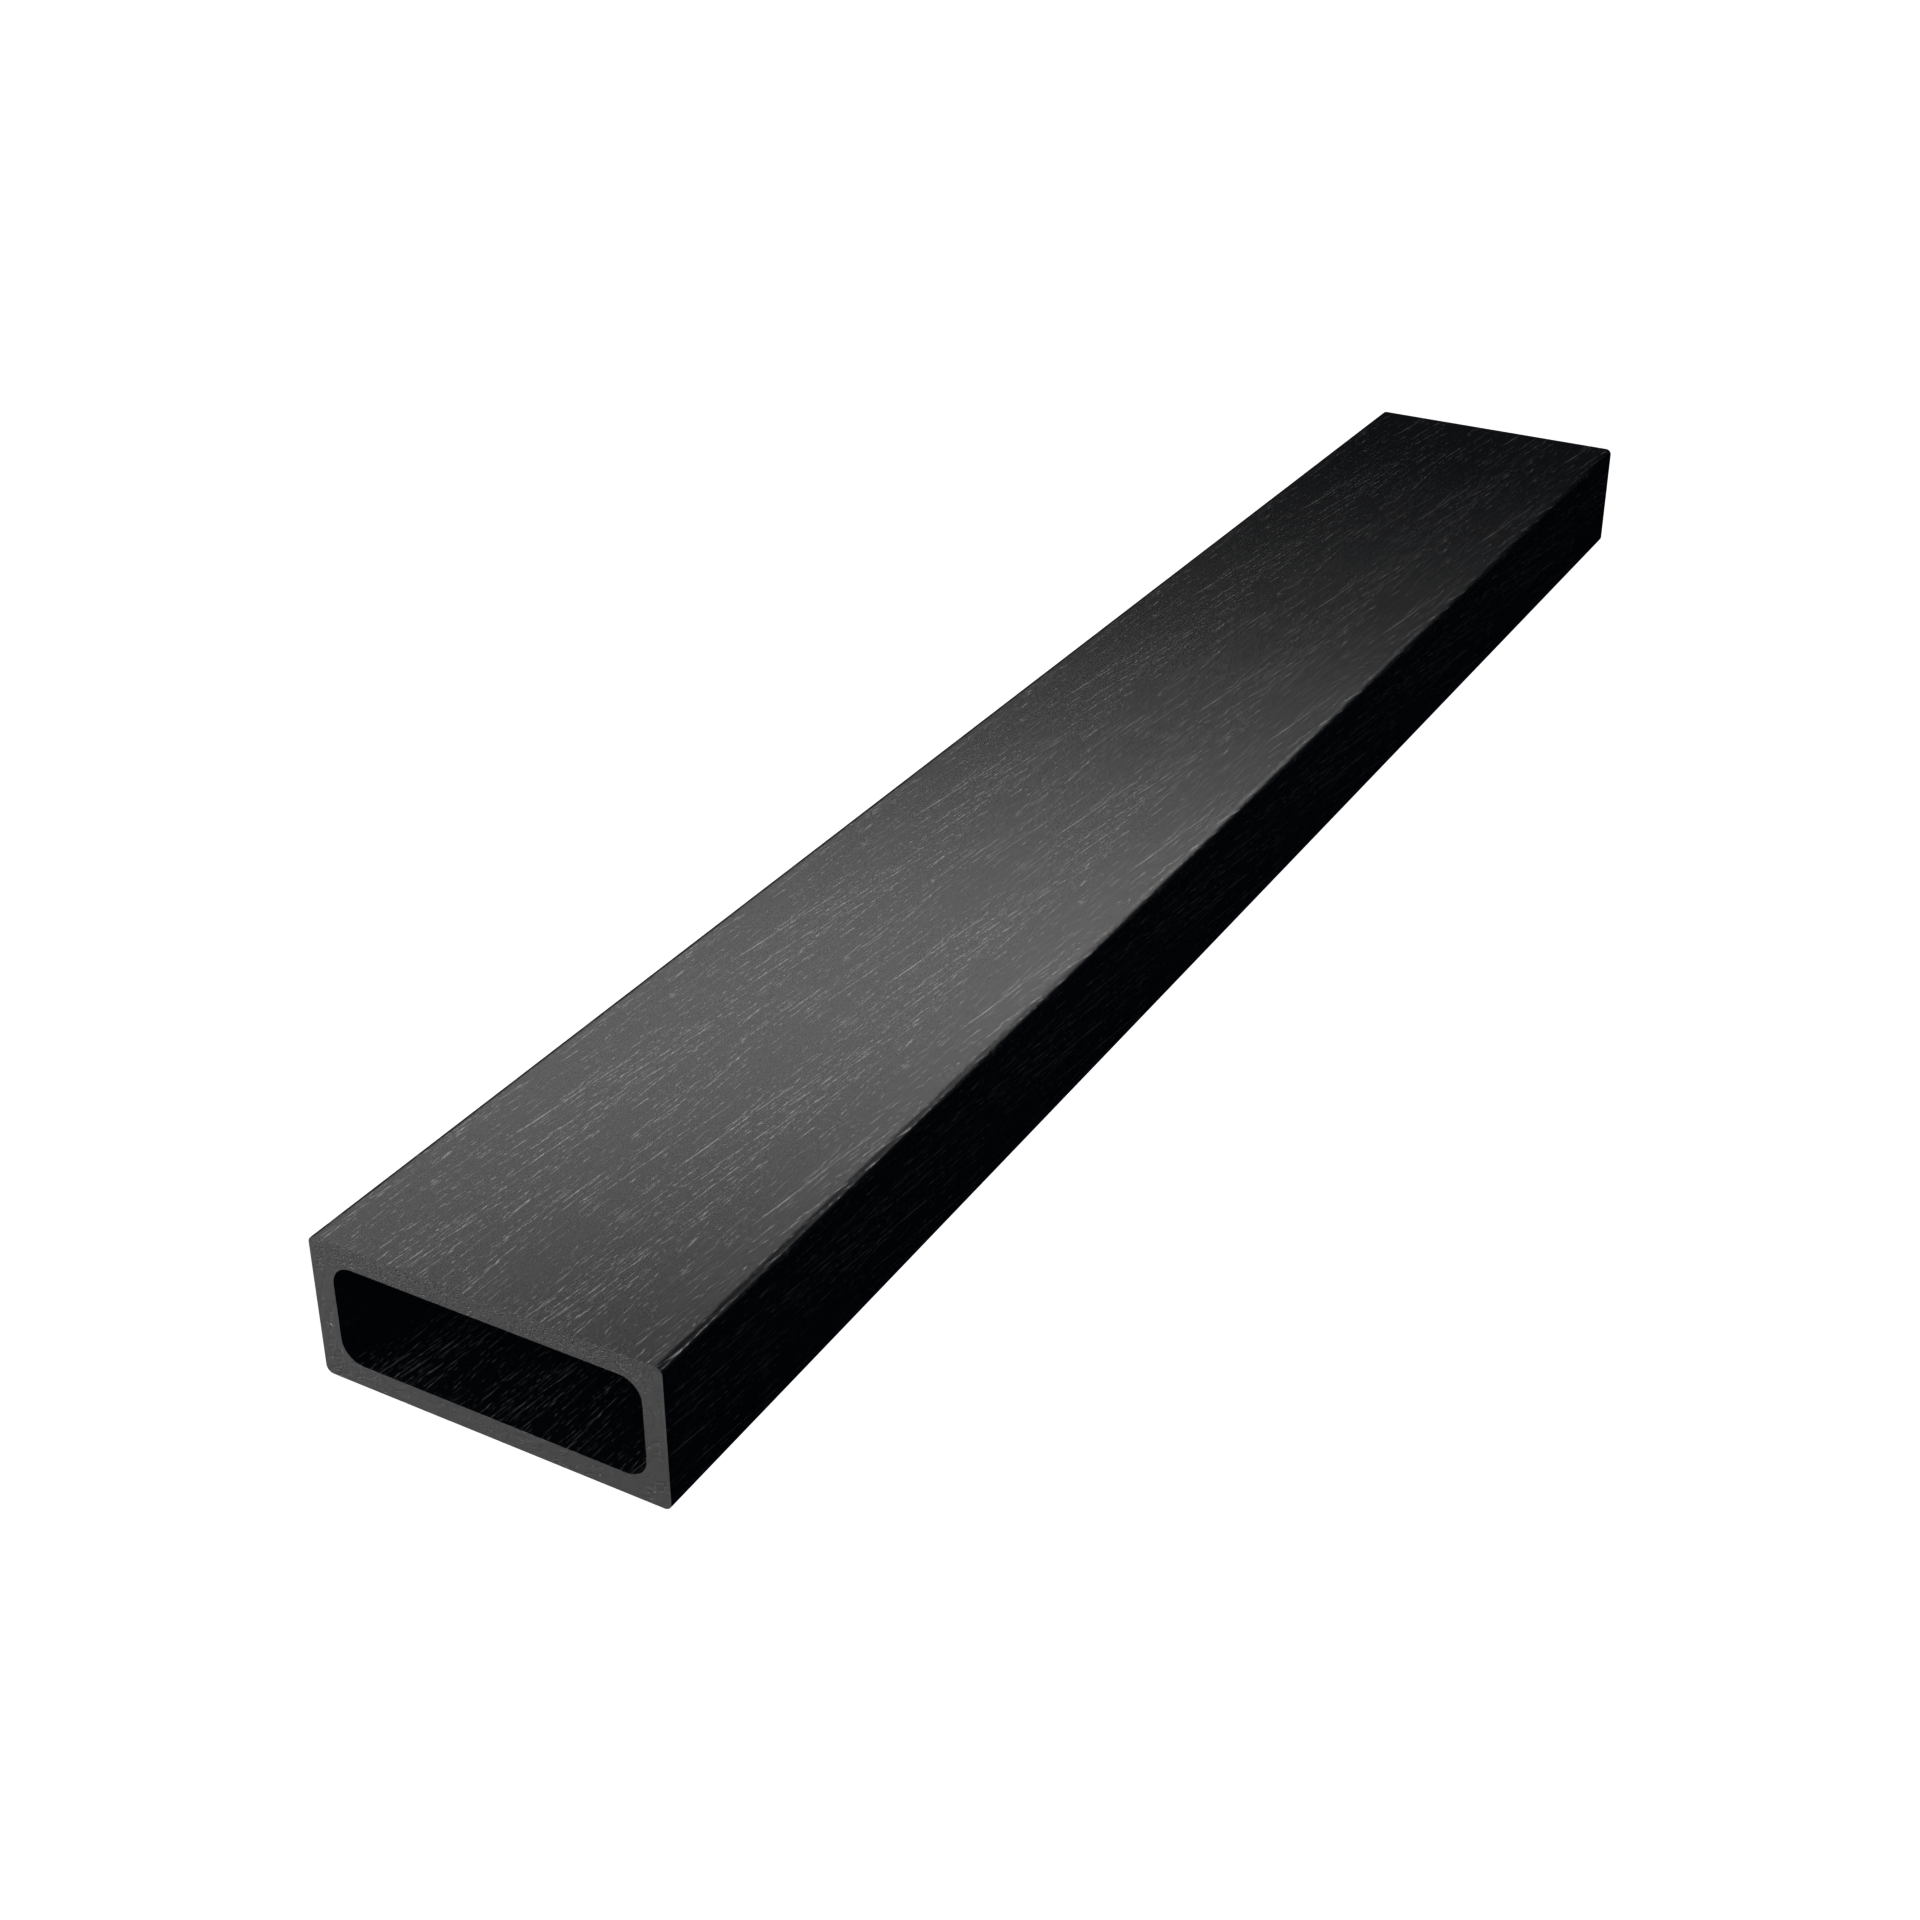 CarboSix carbon fibre Rectangular tube